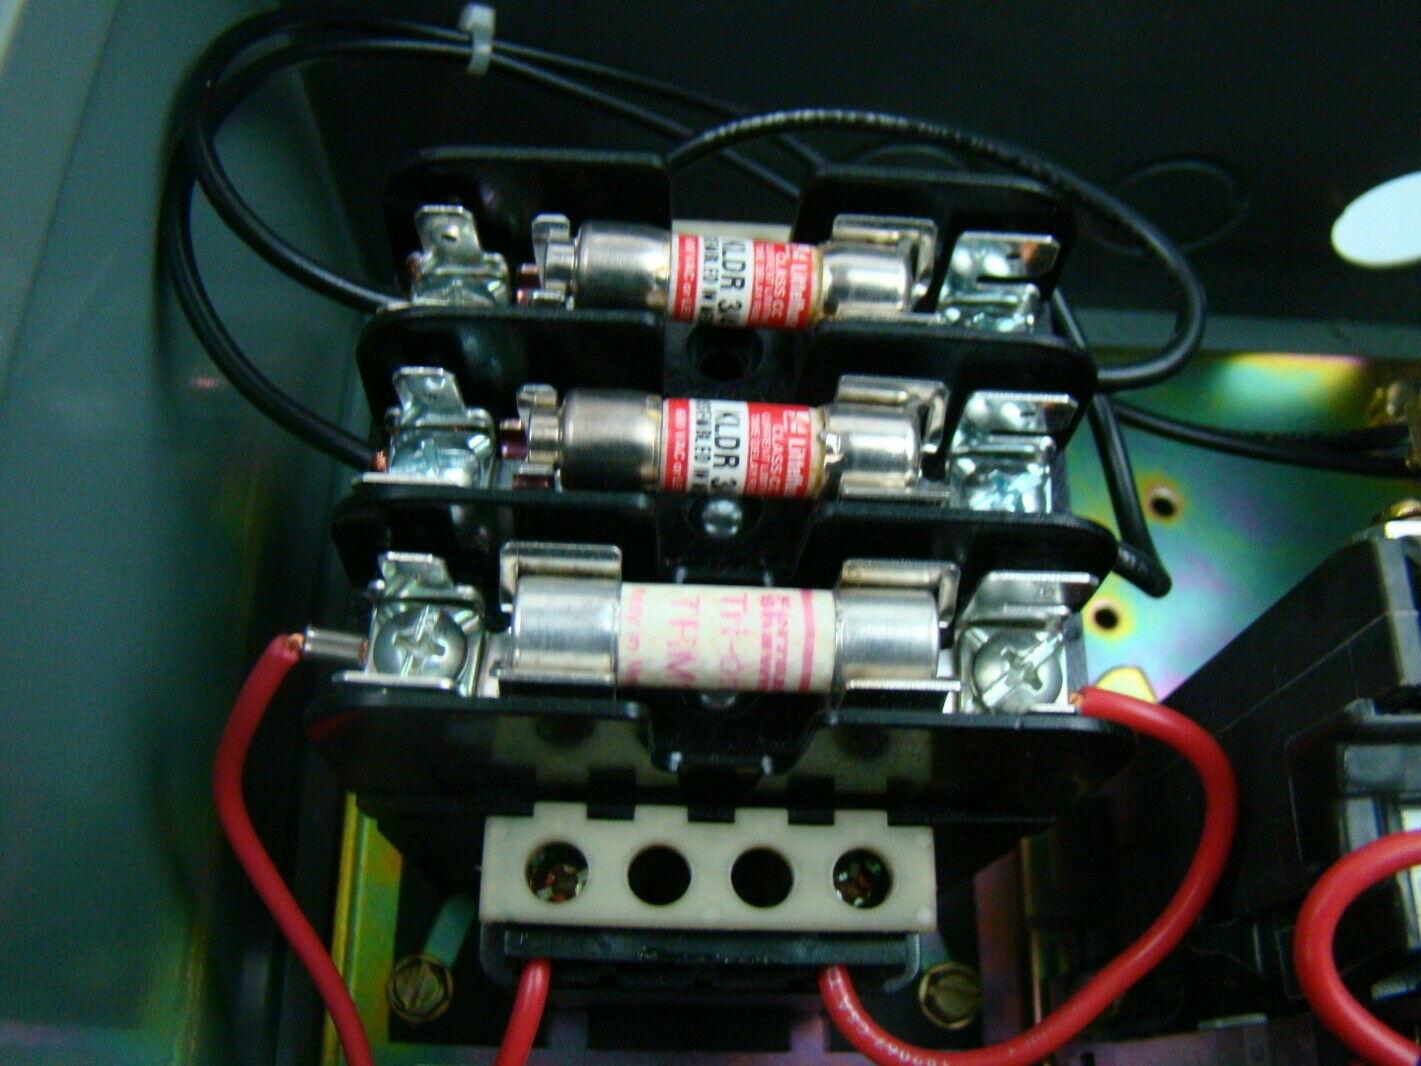 allen bradley motor control wiring diagrams bmw f650gs diagram bulletin 509 magnetic controller